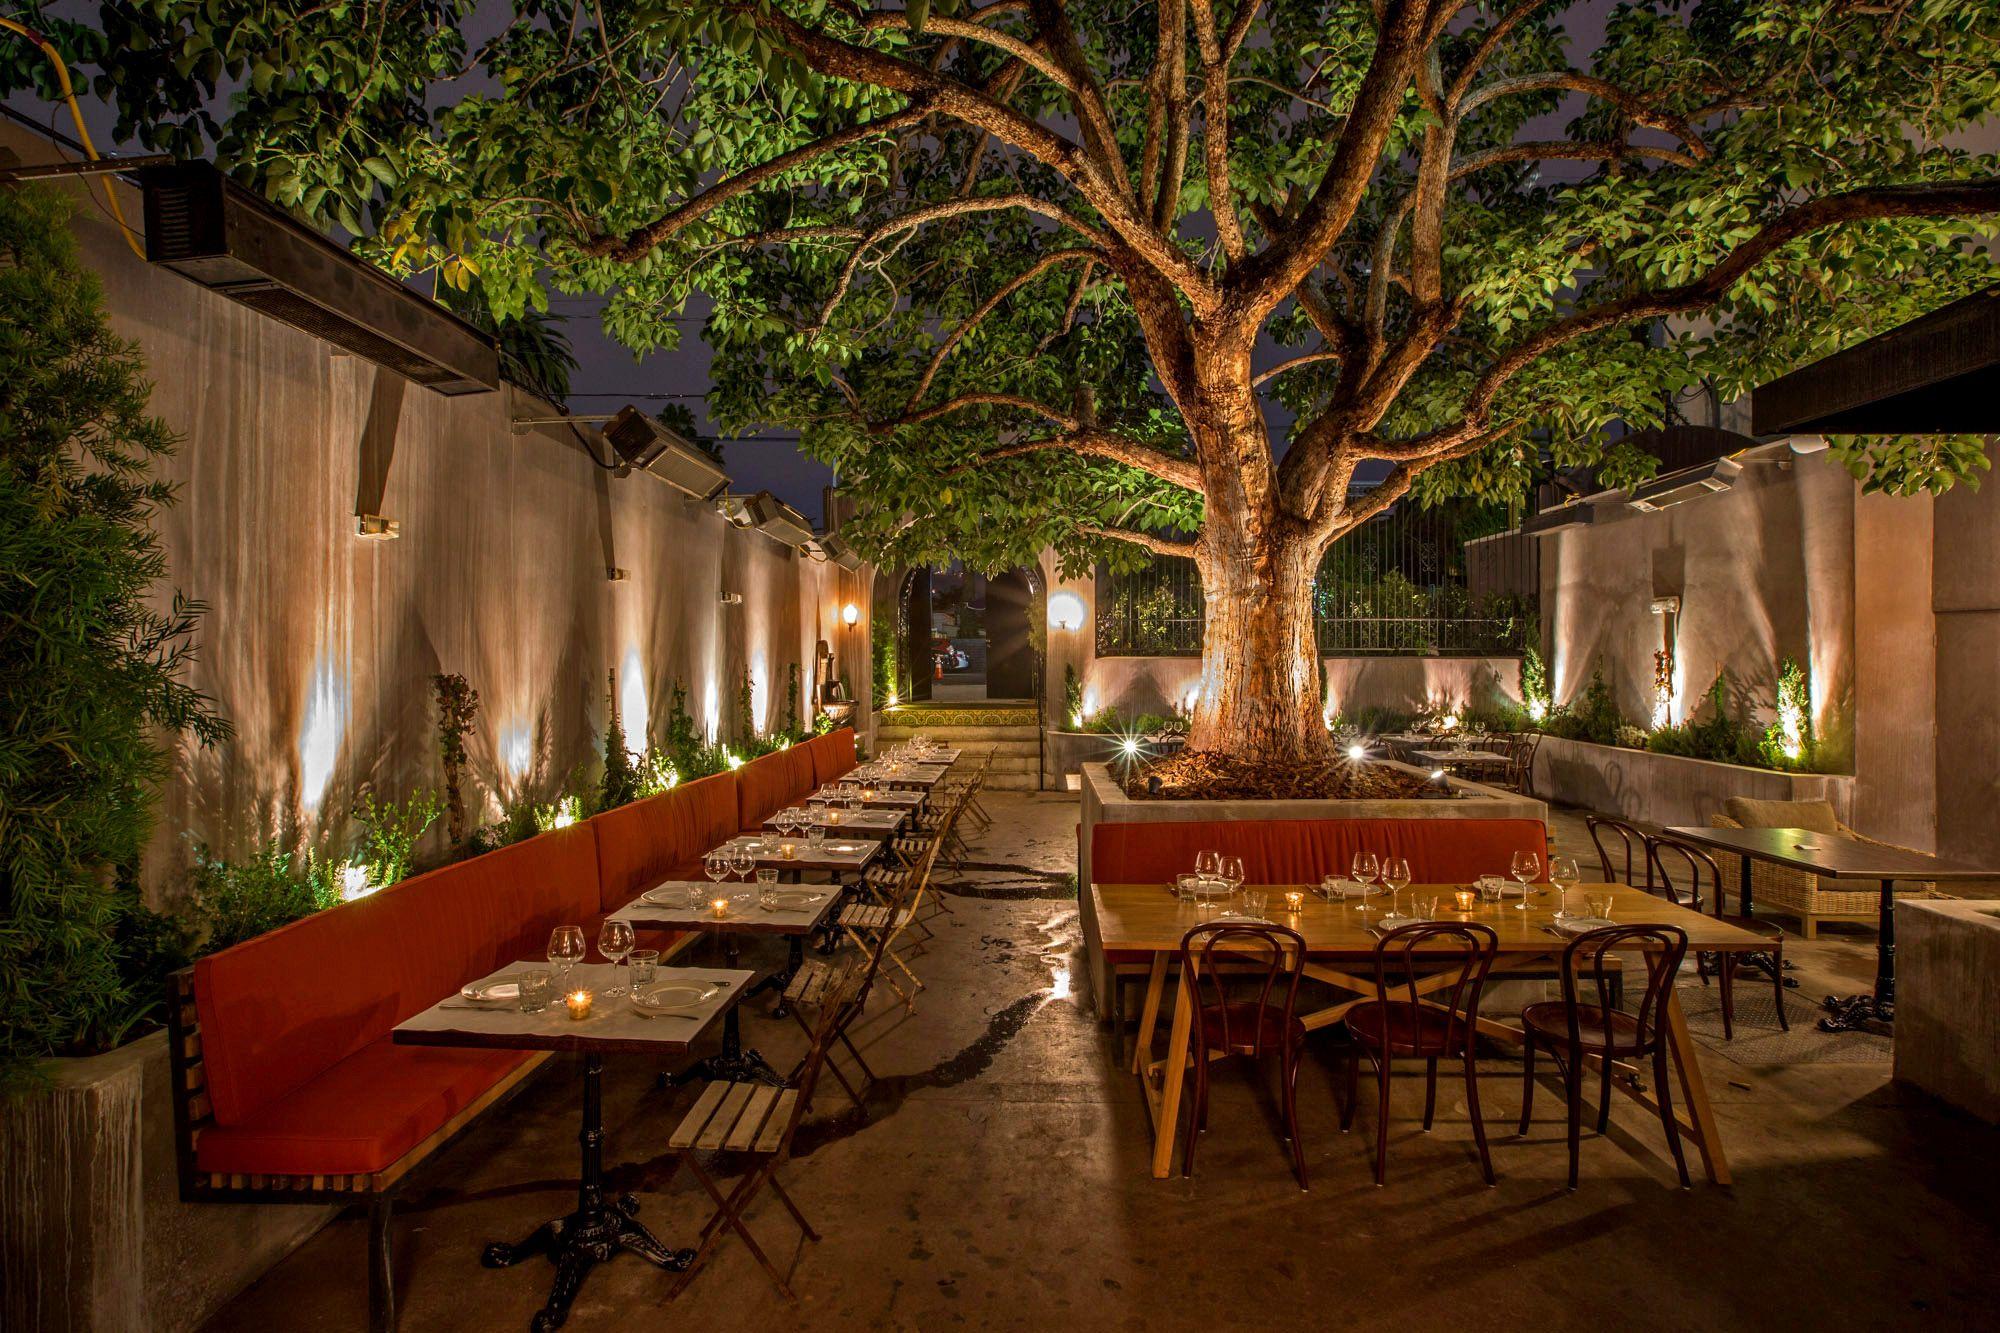 restaurant outdoor patio bars Outdoor dining restaurants in Los Angeles, spring 2017